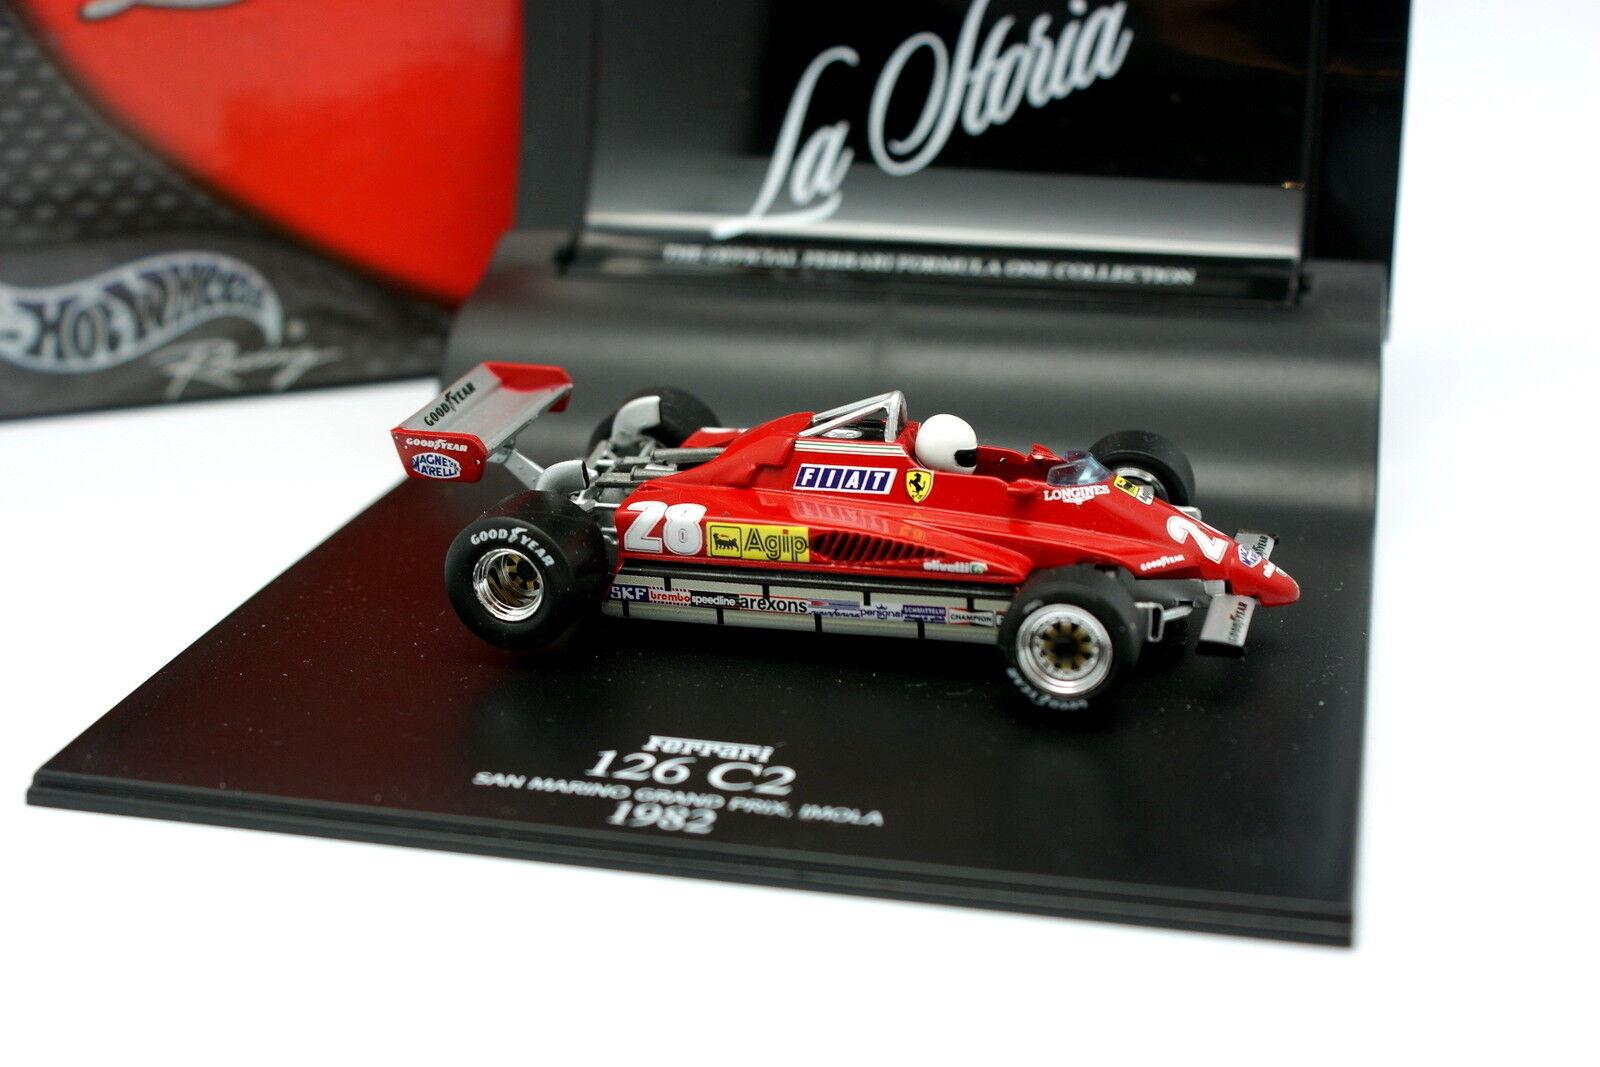 Hot Wheels La Storia 1 43 - F1 Ferrari 126 C2 San Marino GP Imola 1982